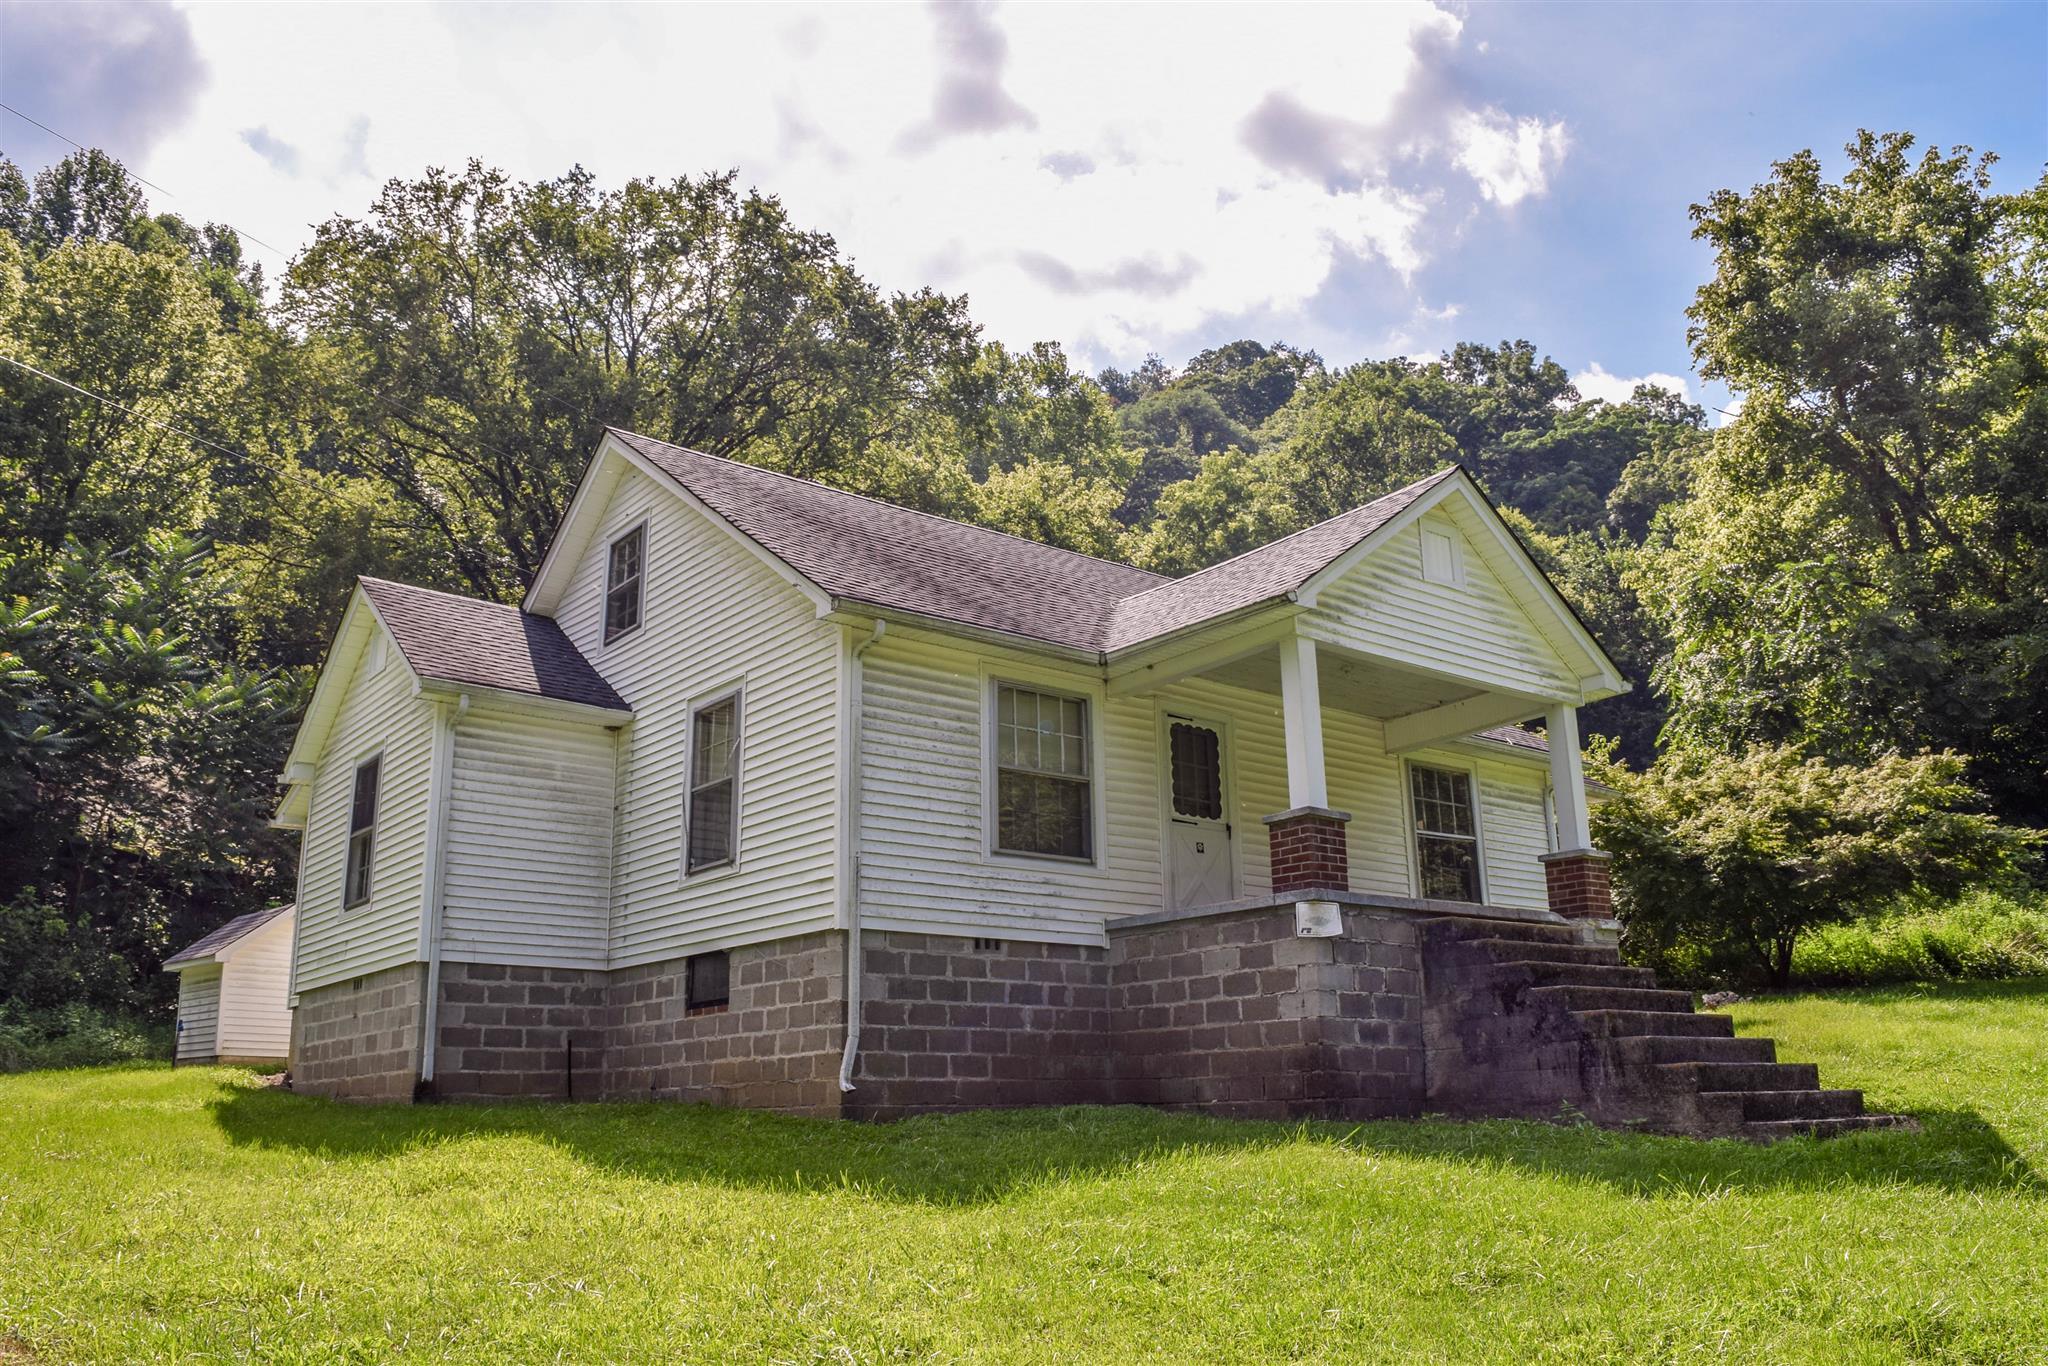 153 Dillehay Hollow Rd, Pleasant Shade, TN 37145